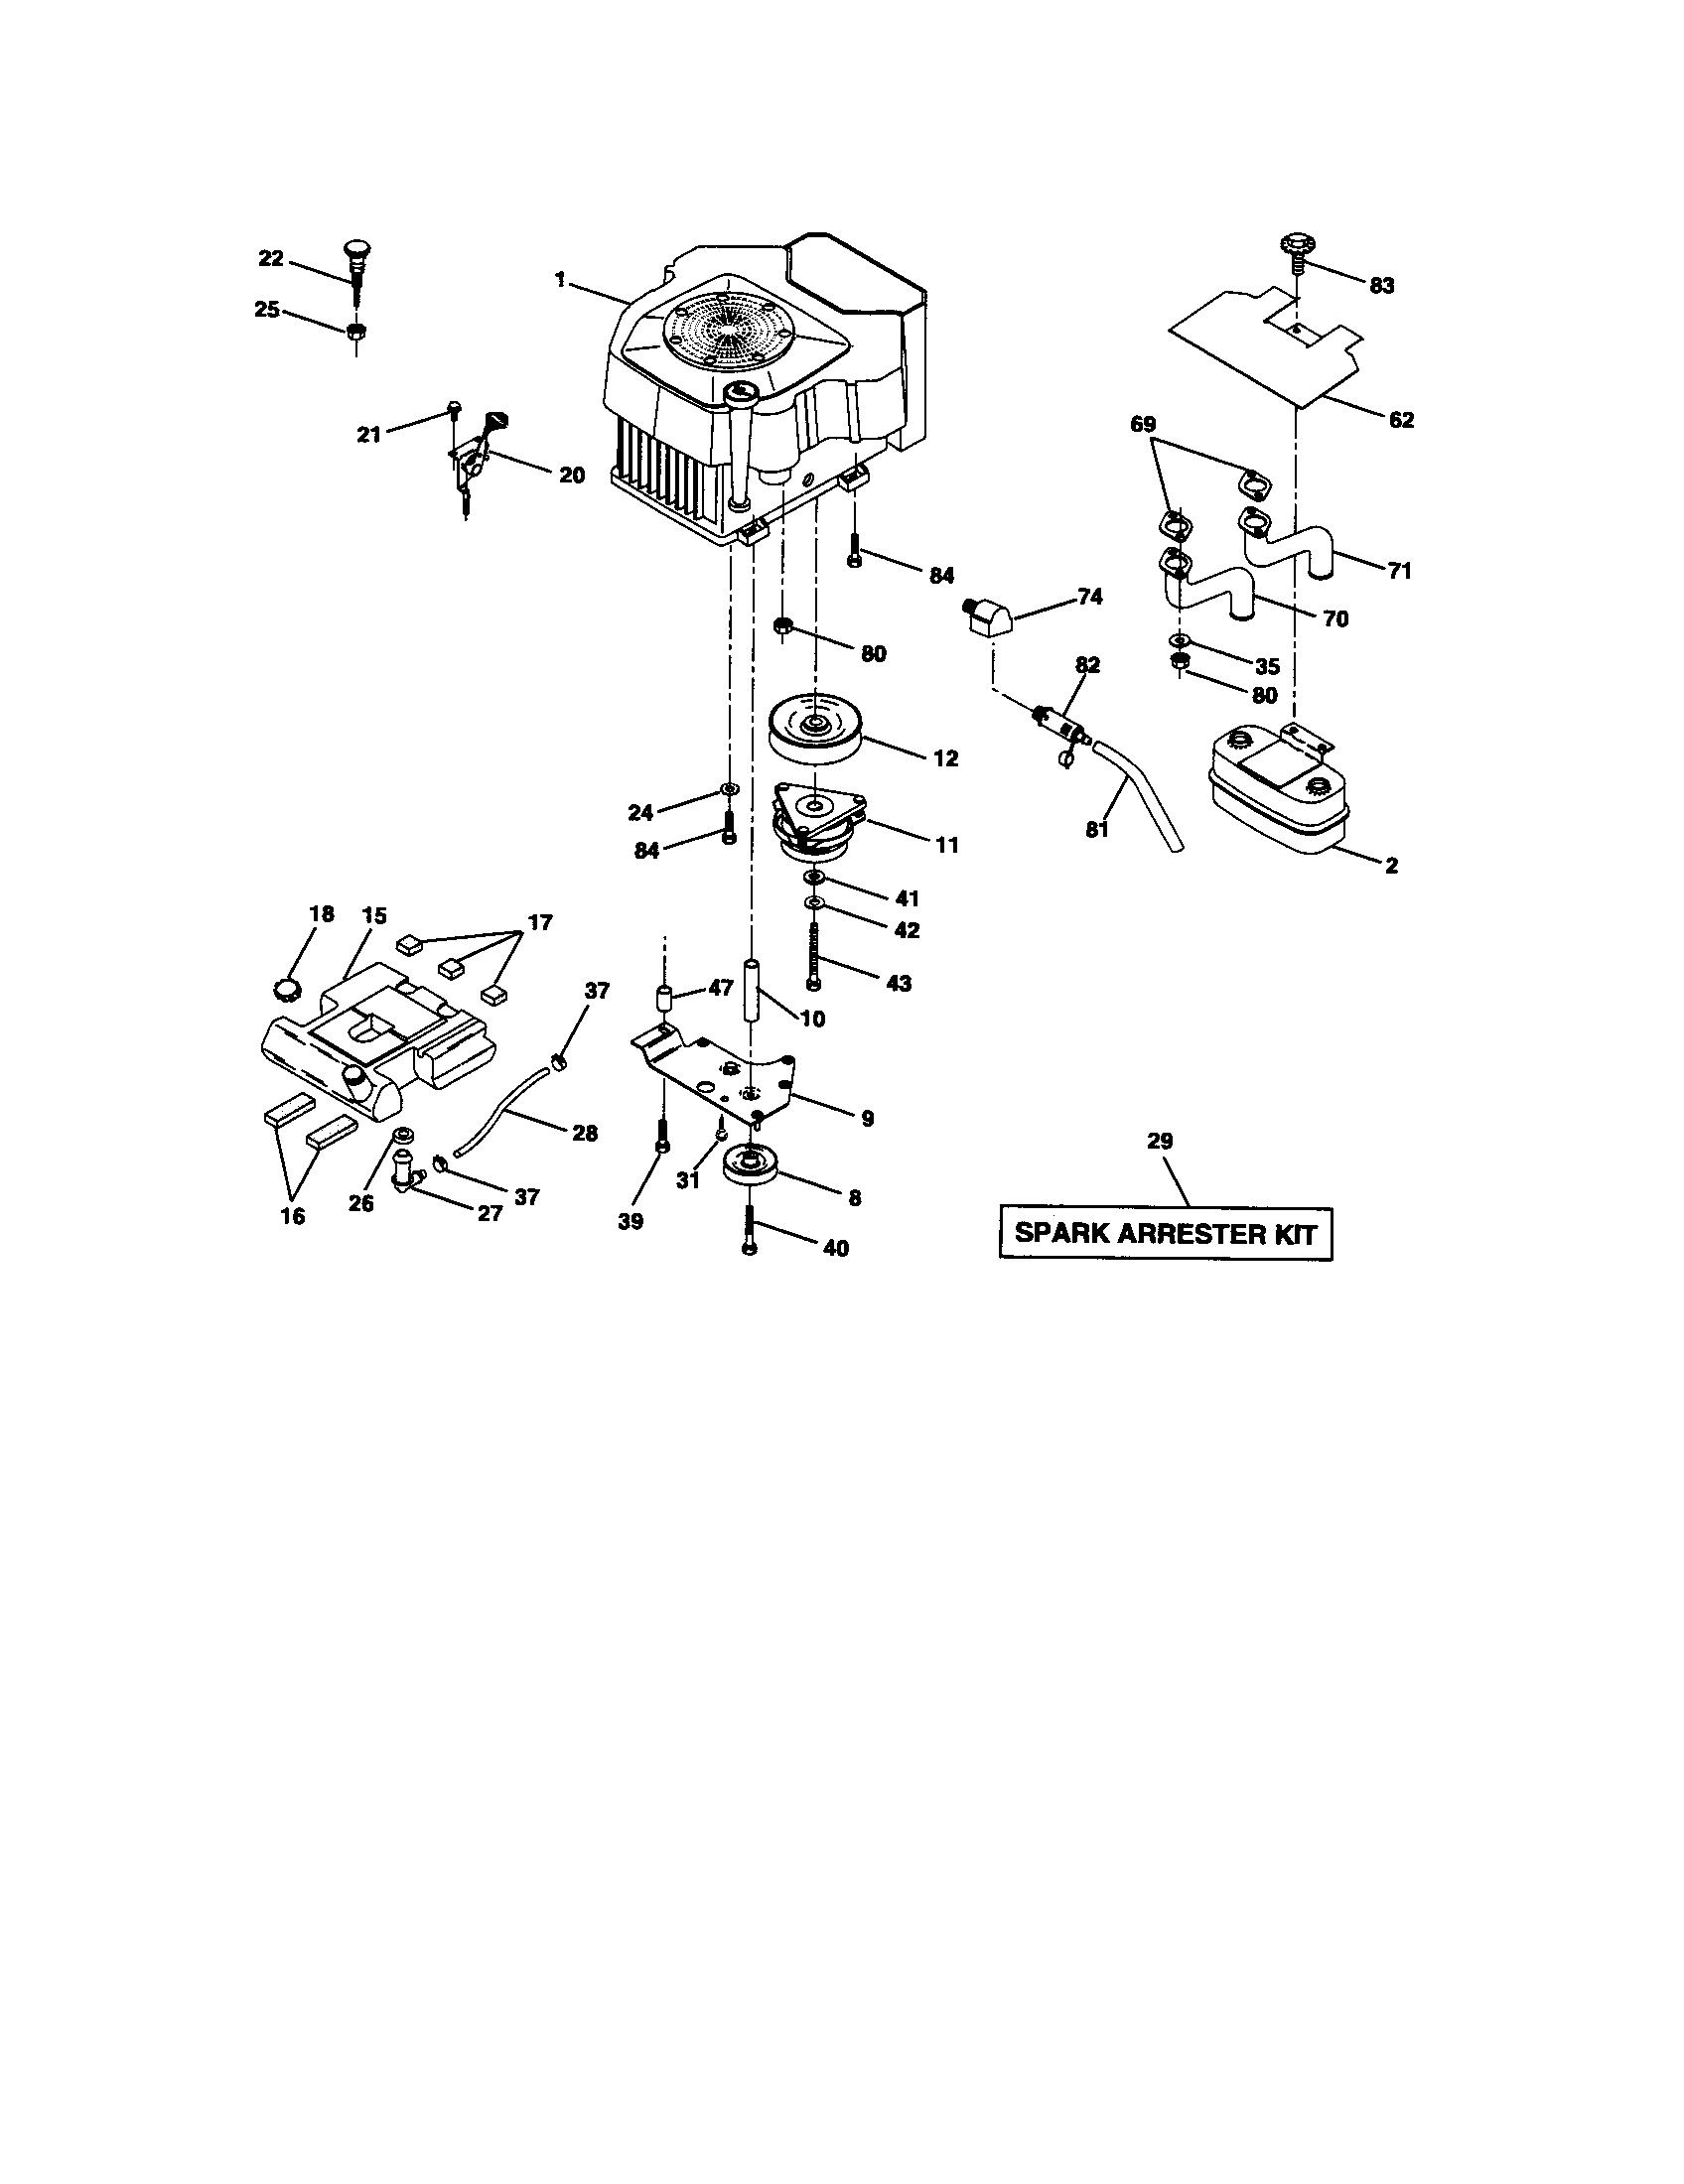 Craftsman lawn tractor parts model 917275021 sears partsdirect